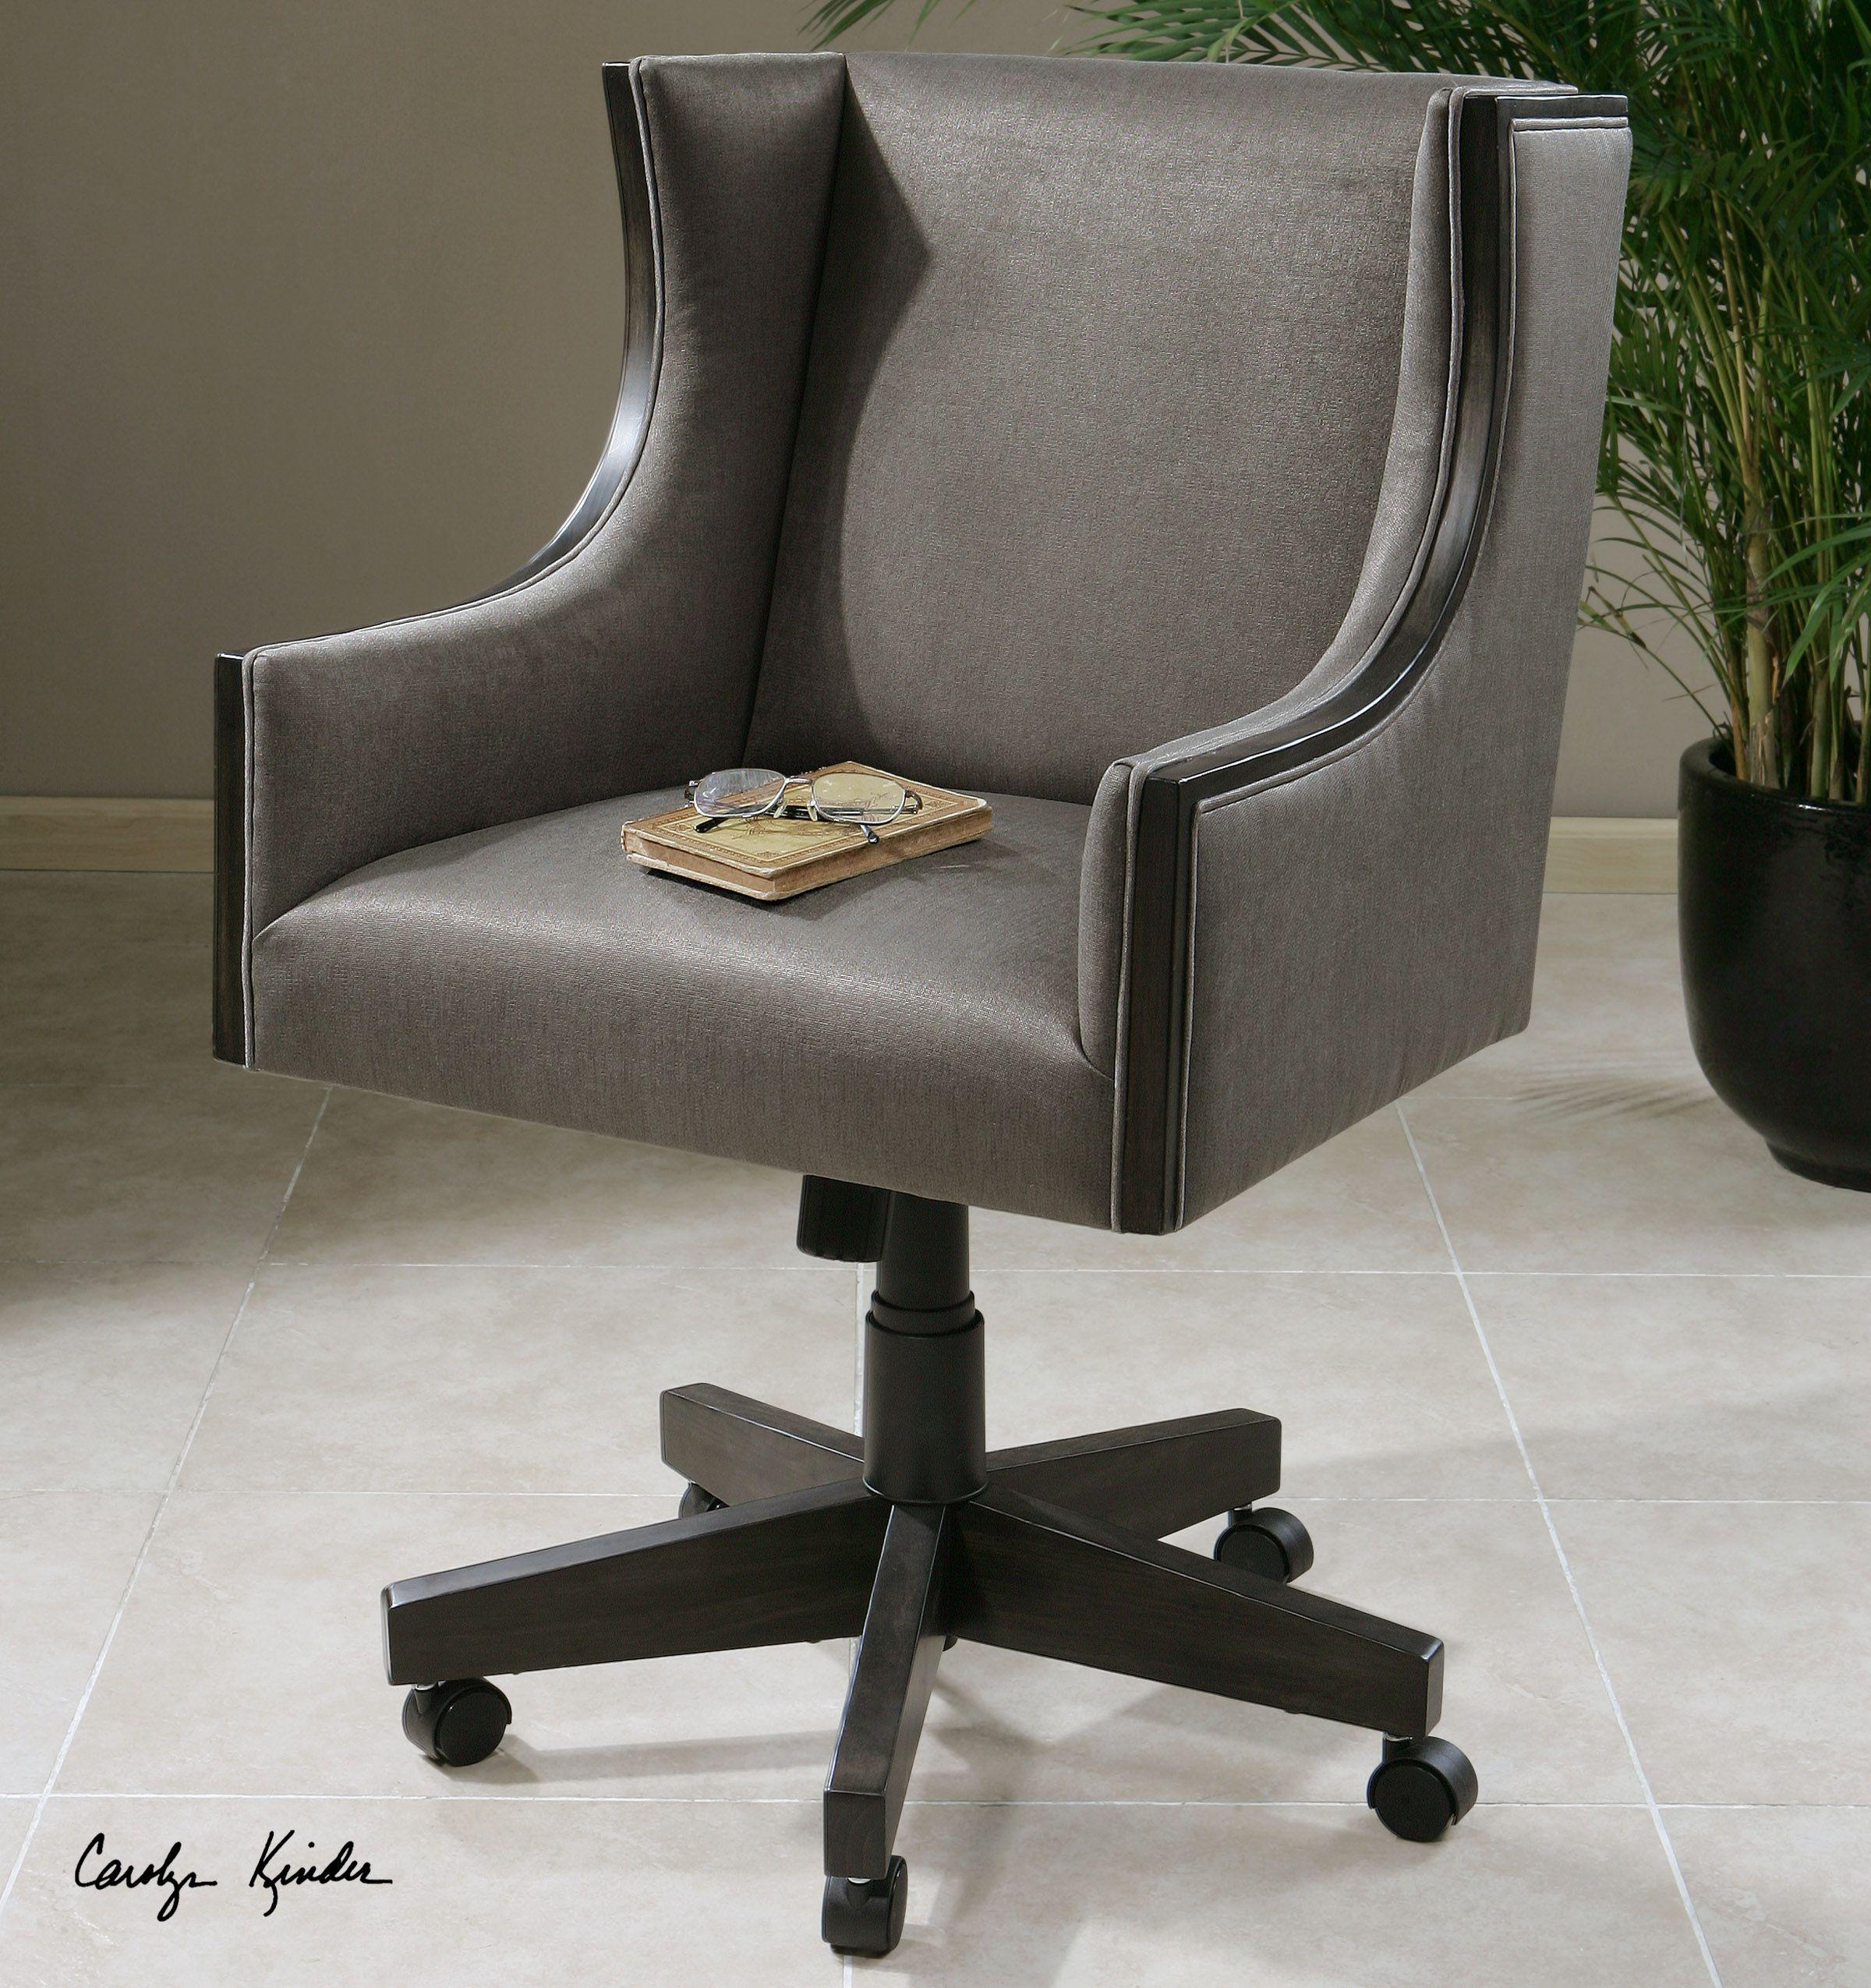 Uttermost Aldina Adjustable Accent Chair